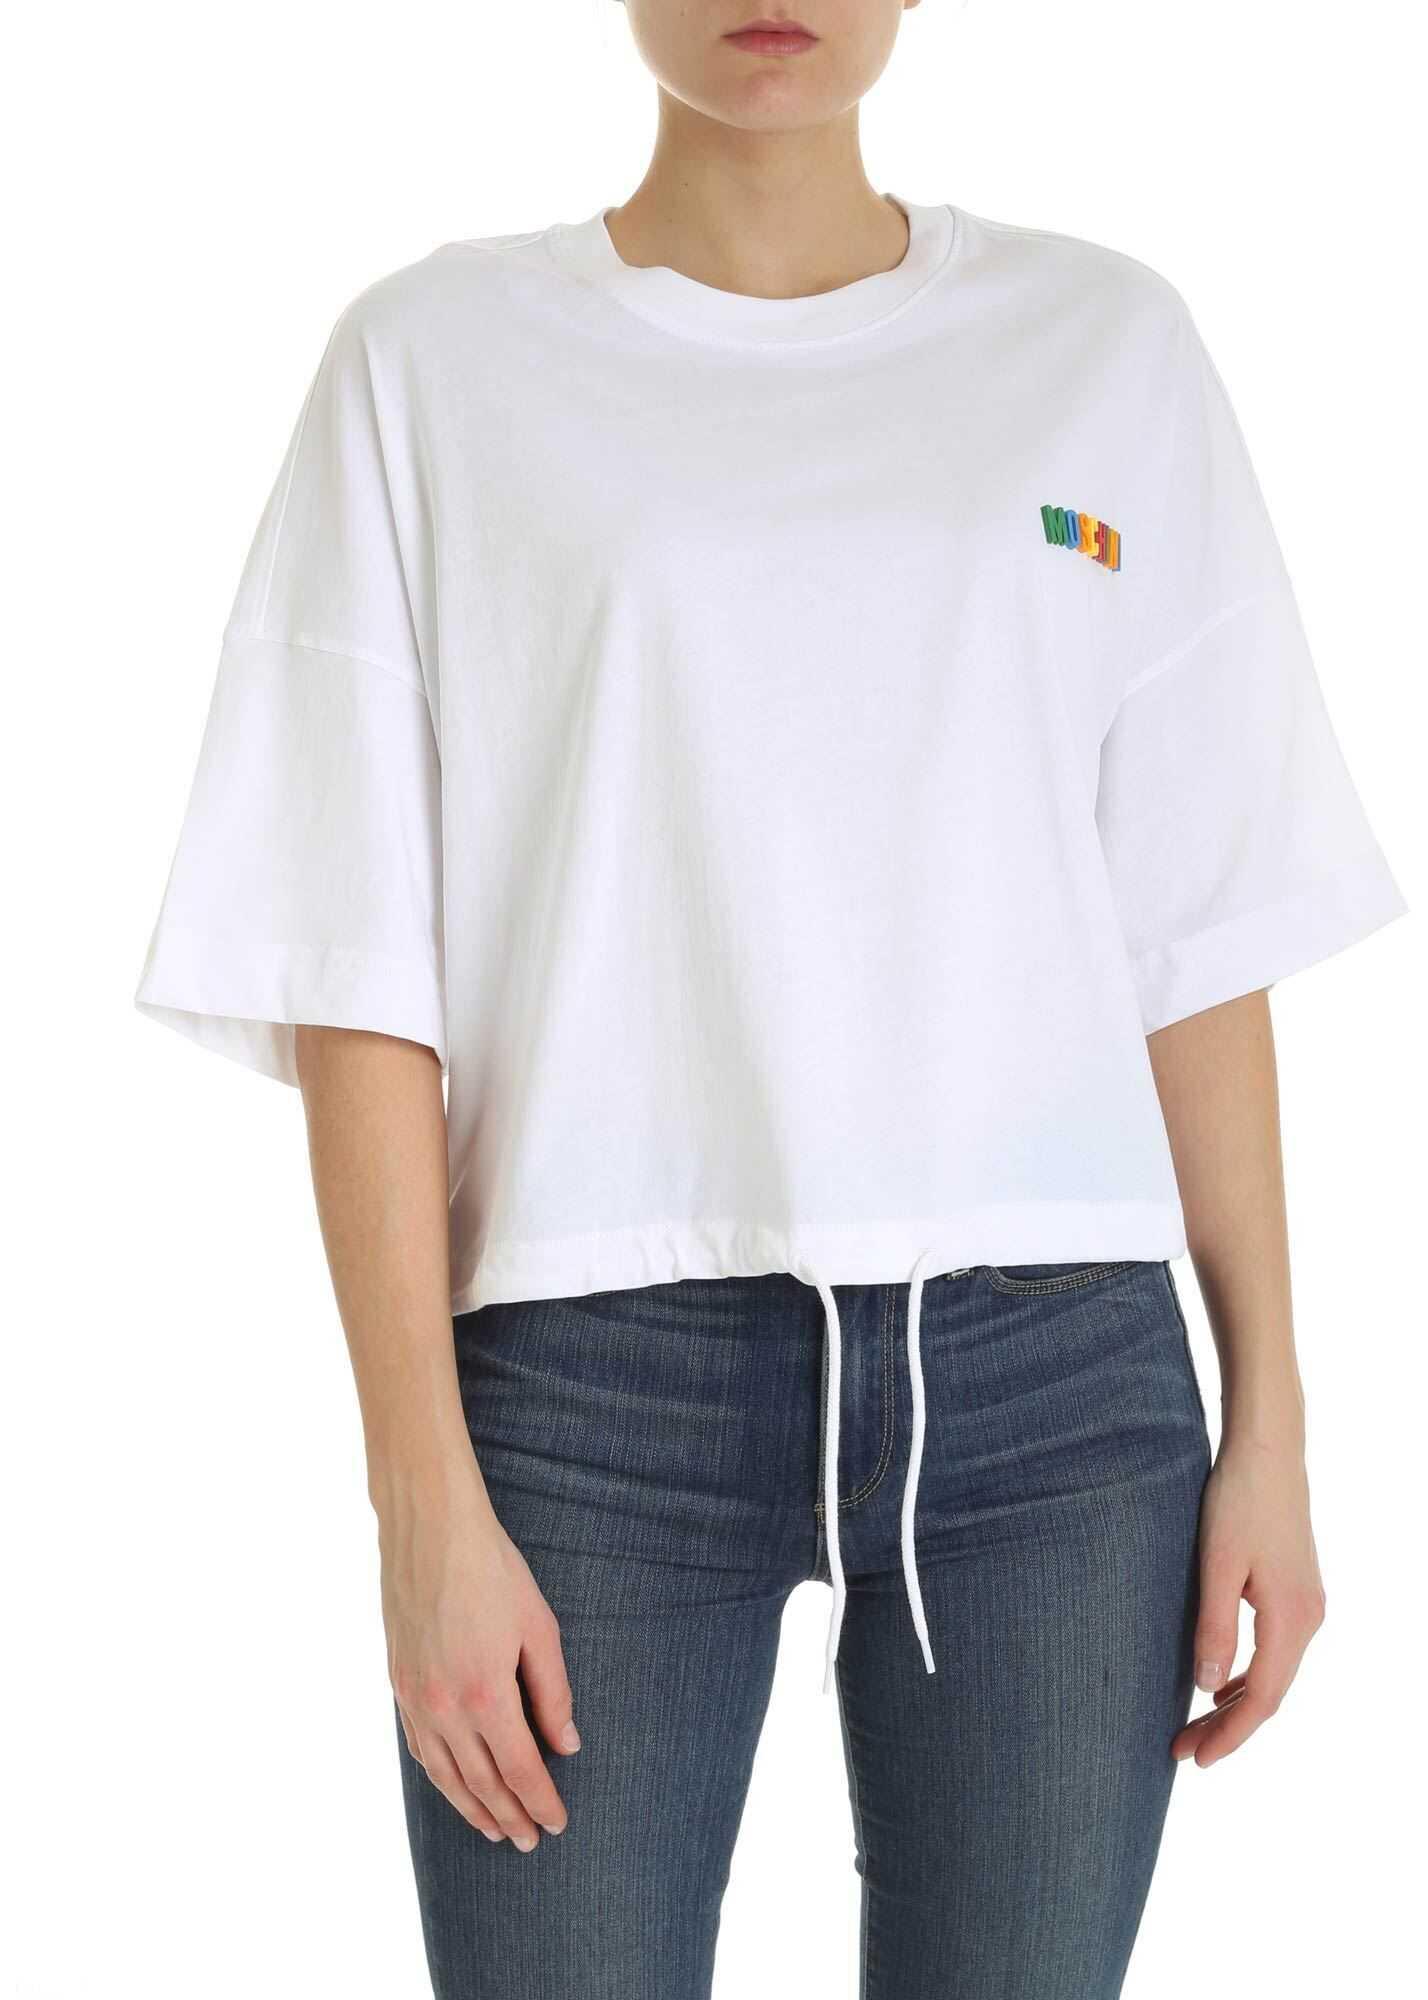 Moschino Multicolor Logo T-Shirt In White White